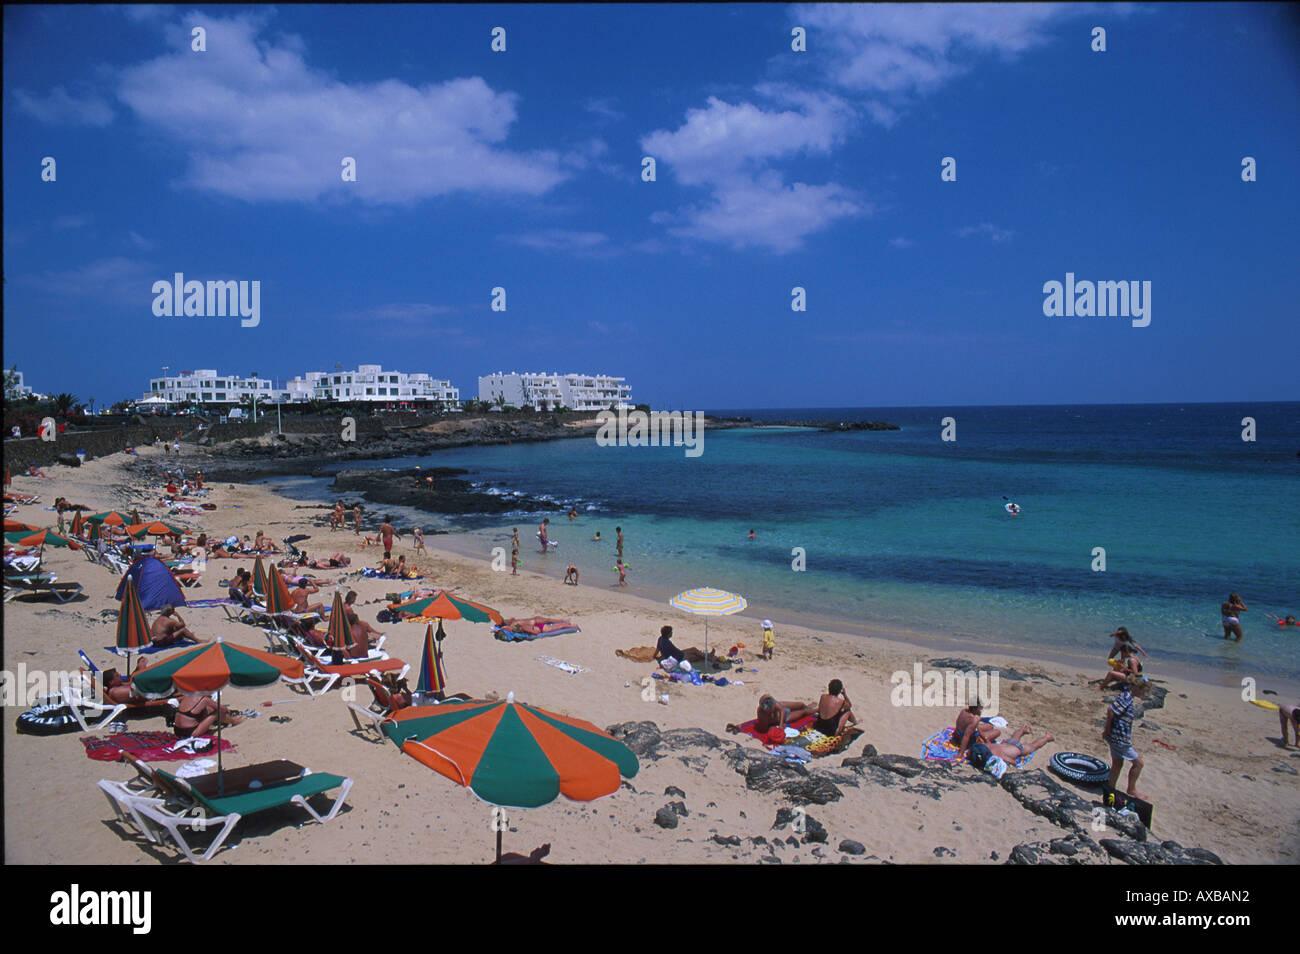 Playa de Jabillo, Lanzarote Kanarische Inseln, Spanien Stockbild